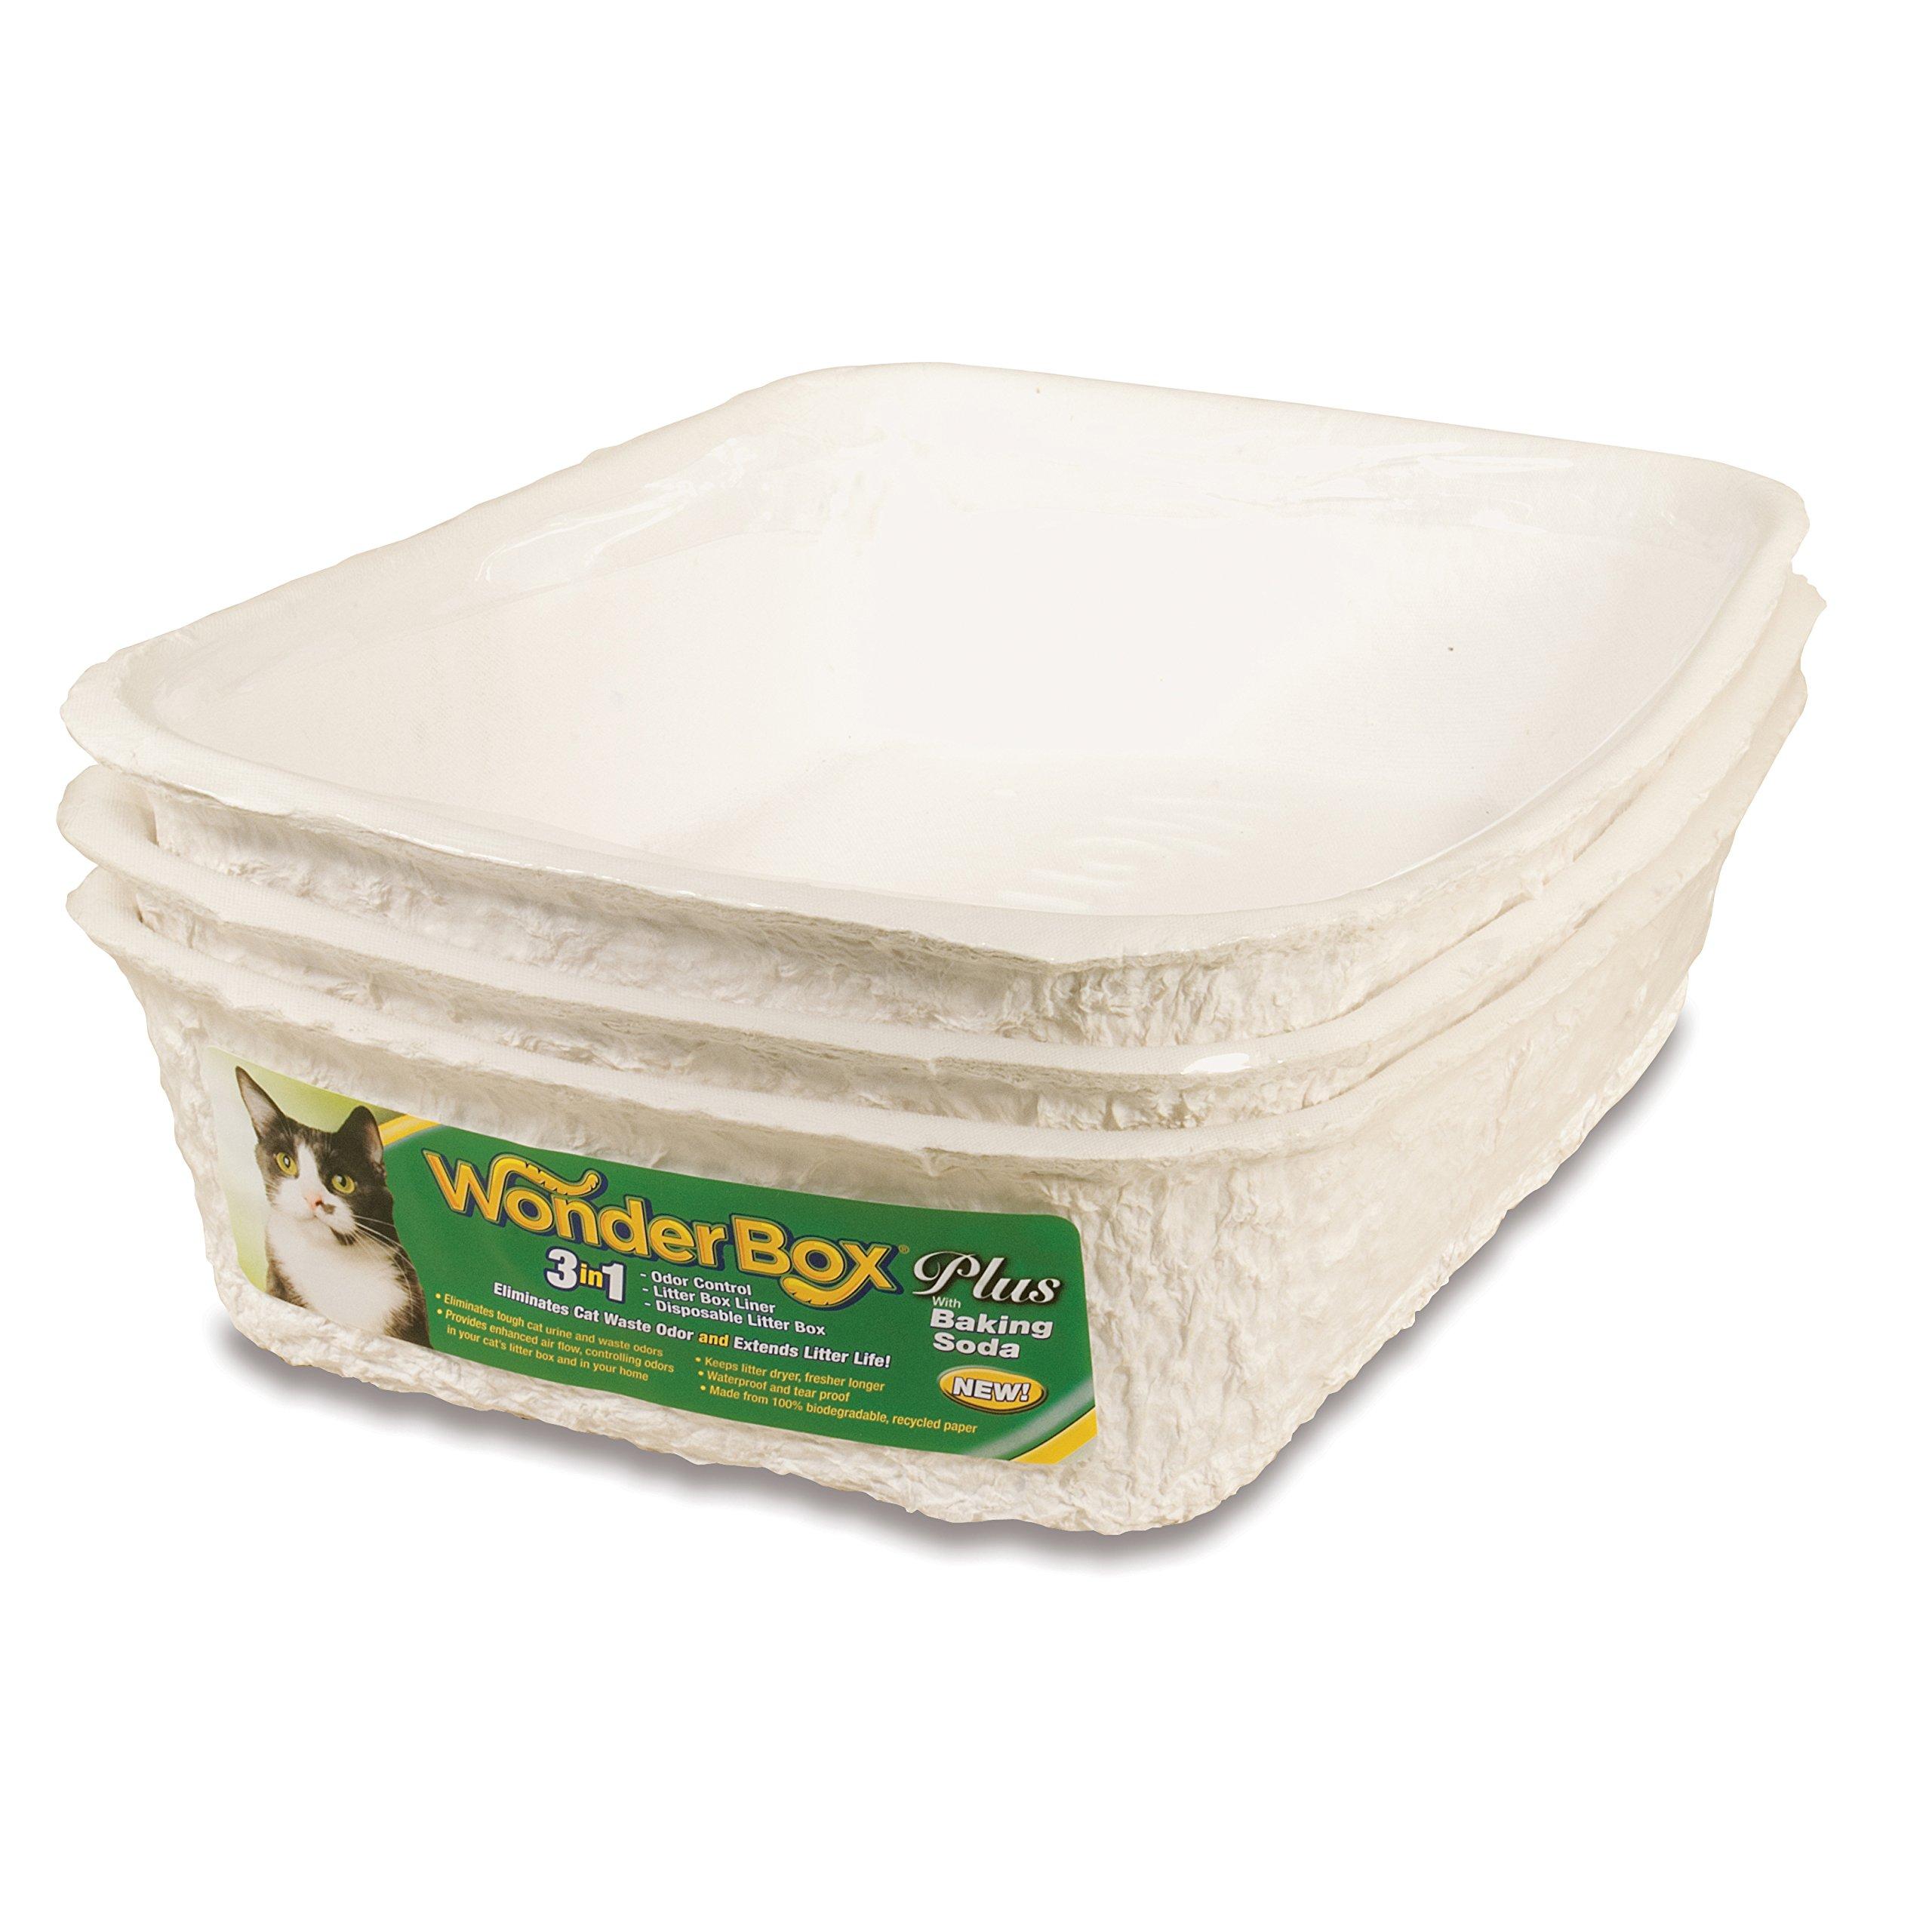 Kitty's WonderBox Disposable Litter Box, Medium, 3-Count